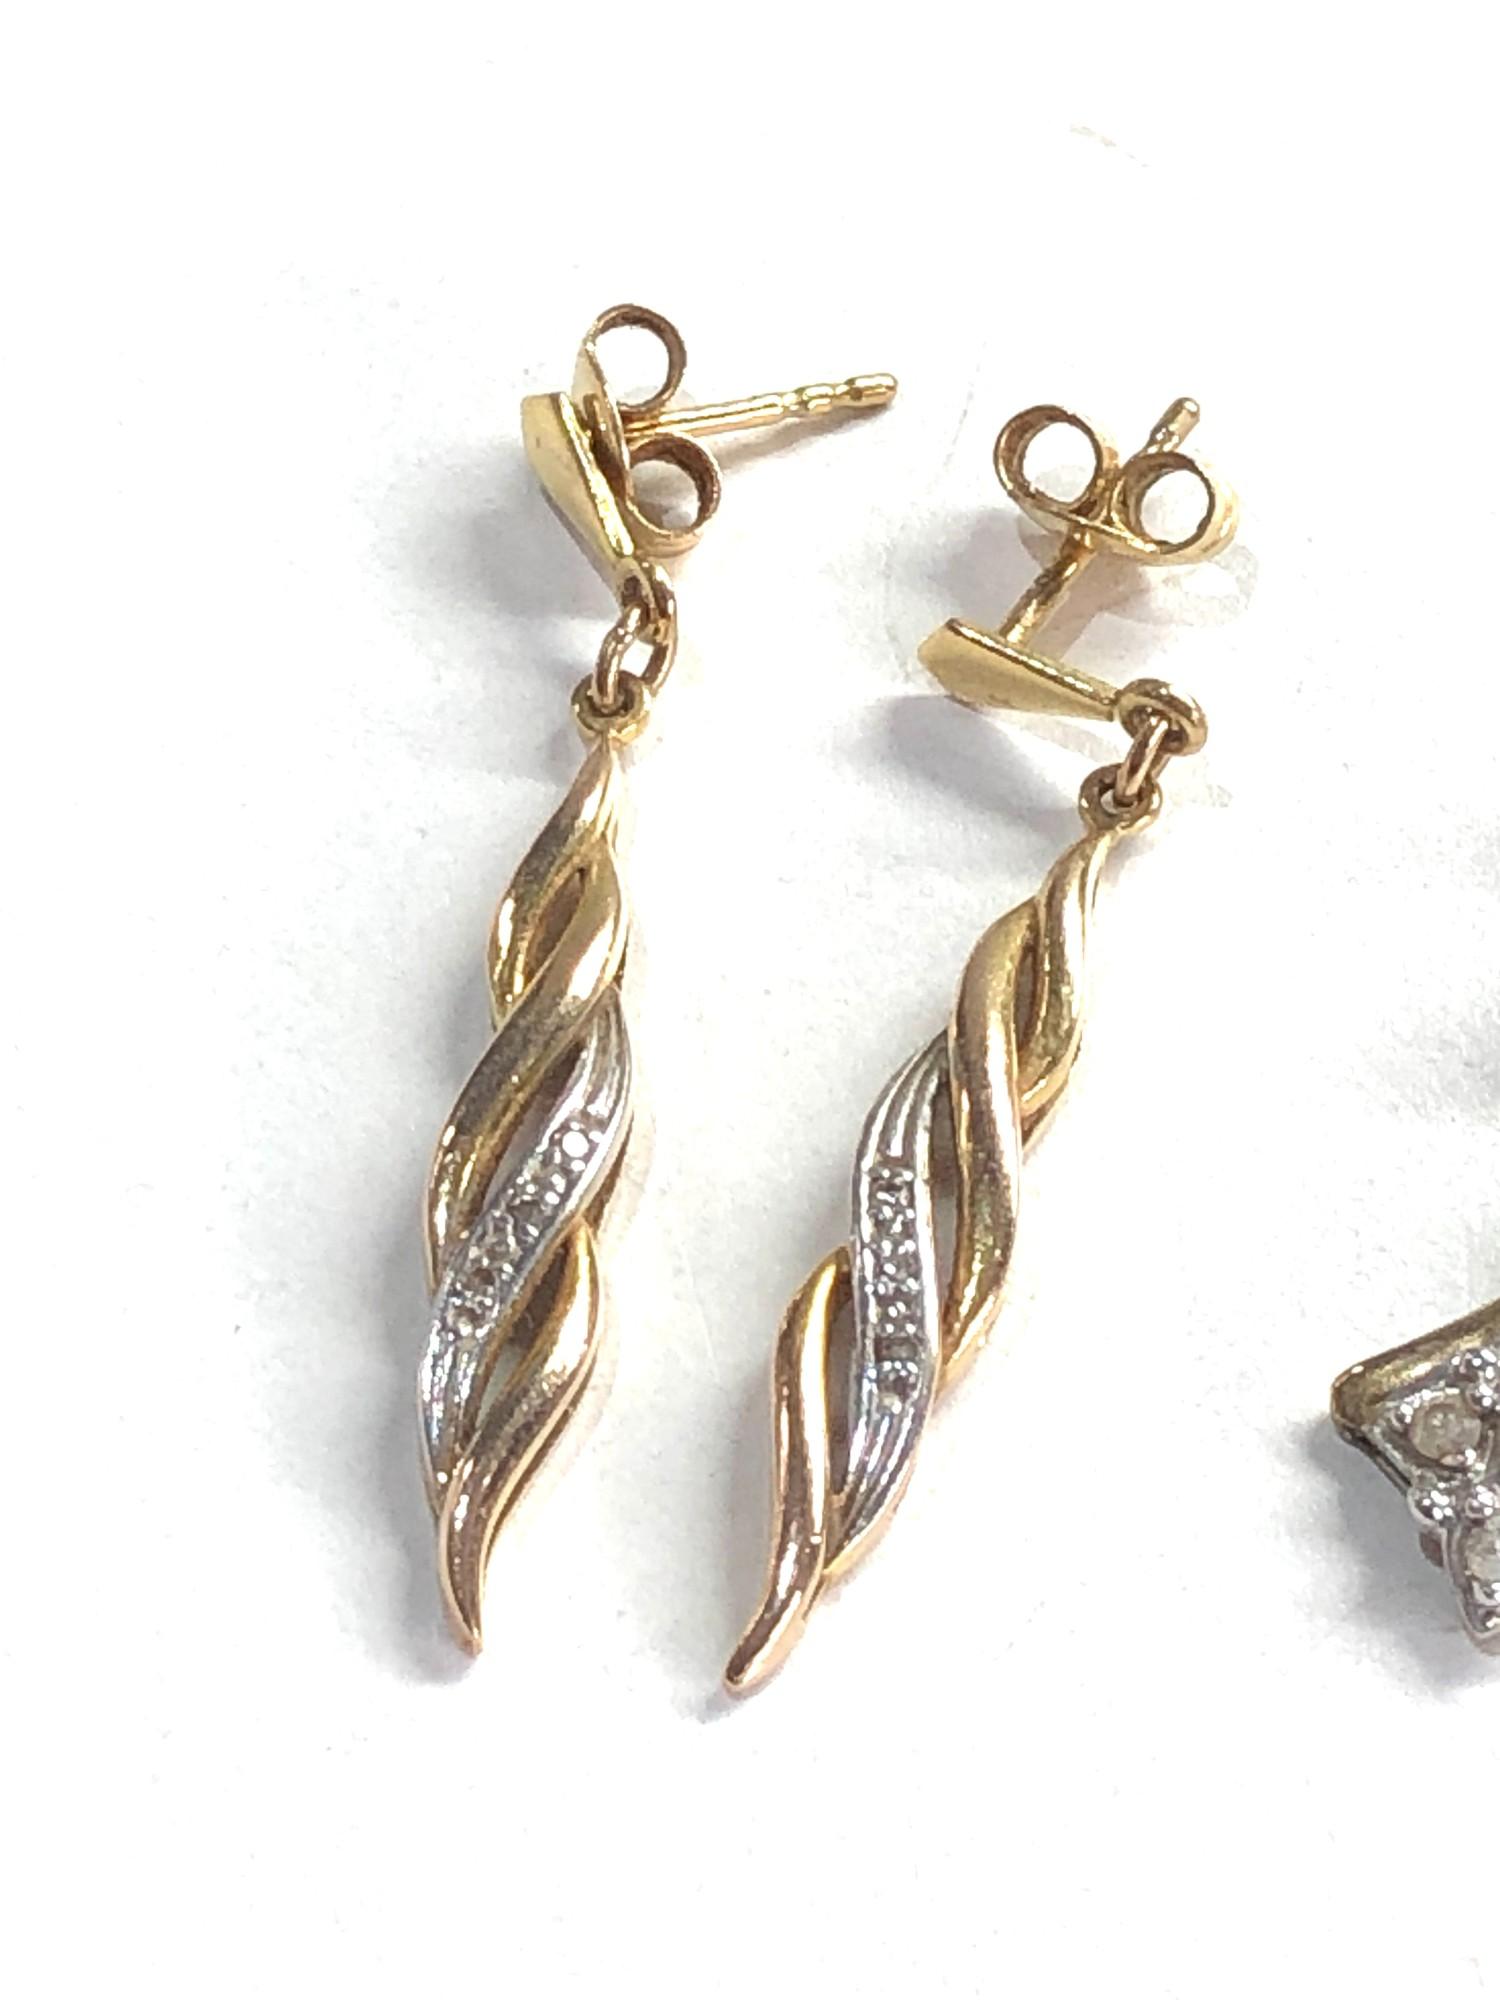 2 x 9ct Gold drop earrings w/ diamond detail 4.9g - Image 2 of 3